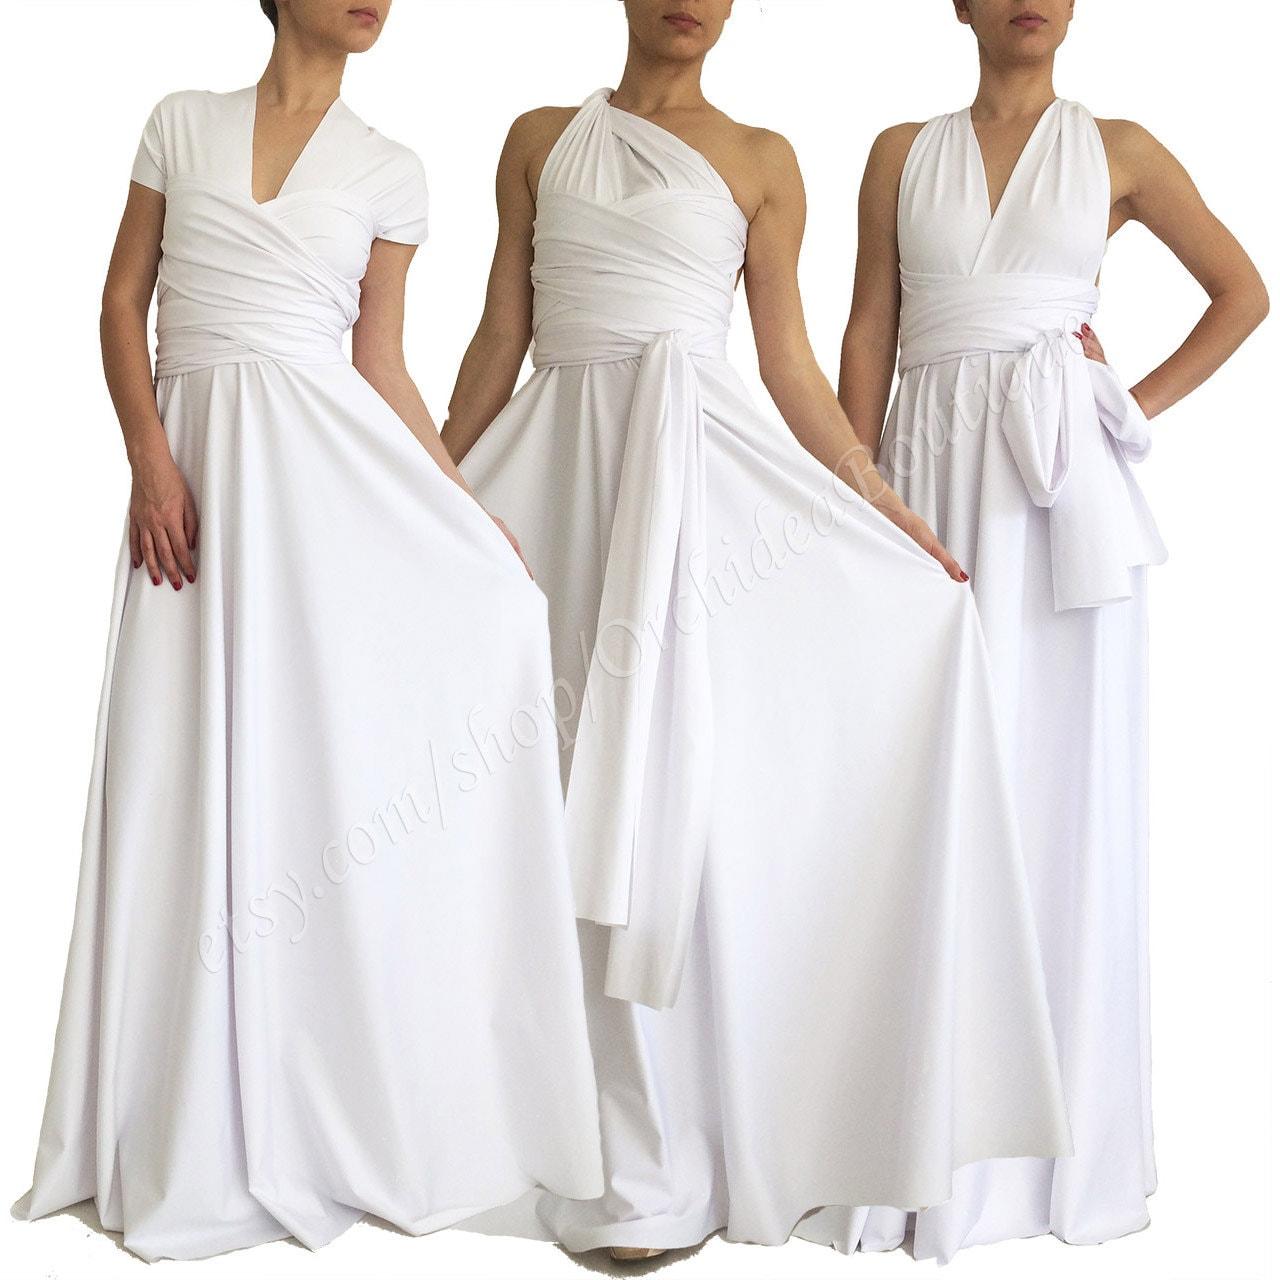 Infinity Wedding Dress Larimeloom: Beach Wedding Dress/ Convertible Dress/ Infinity Dress/